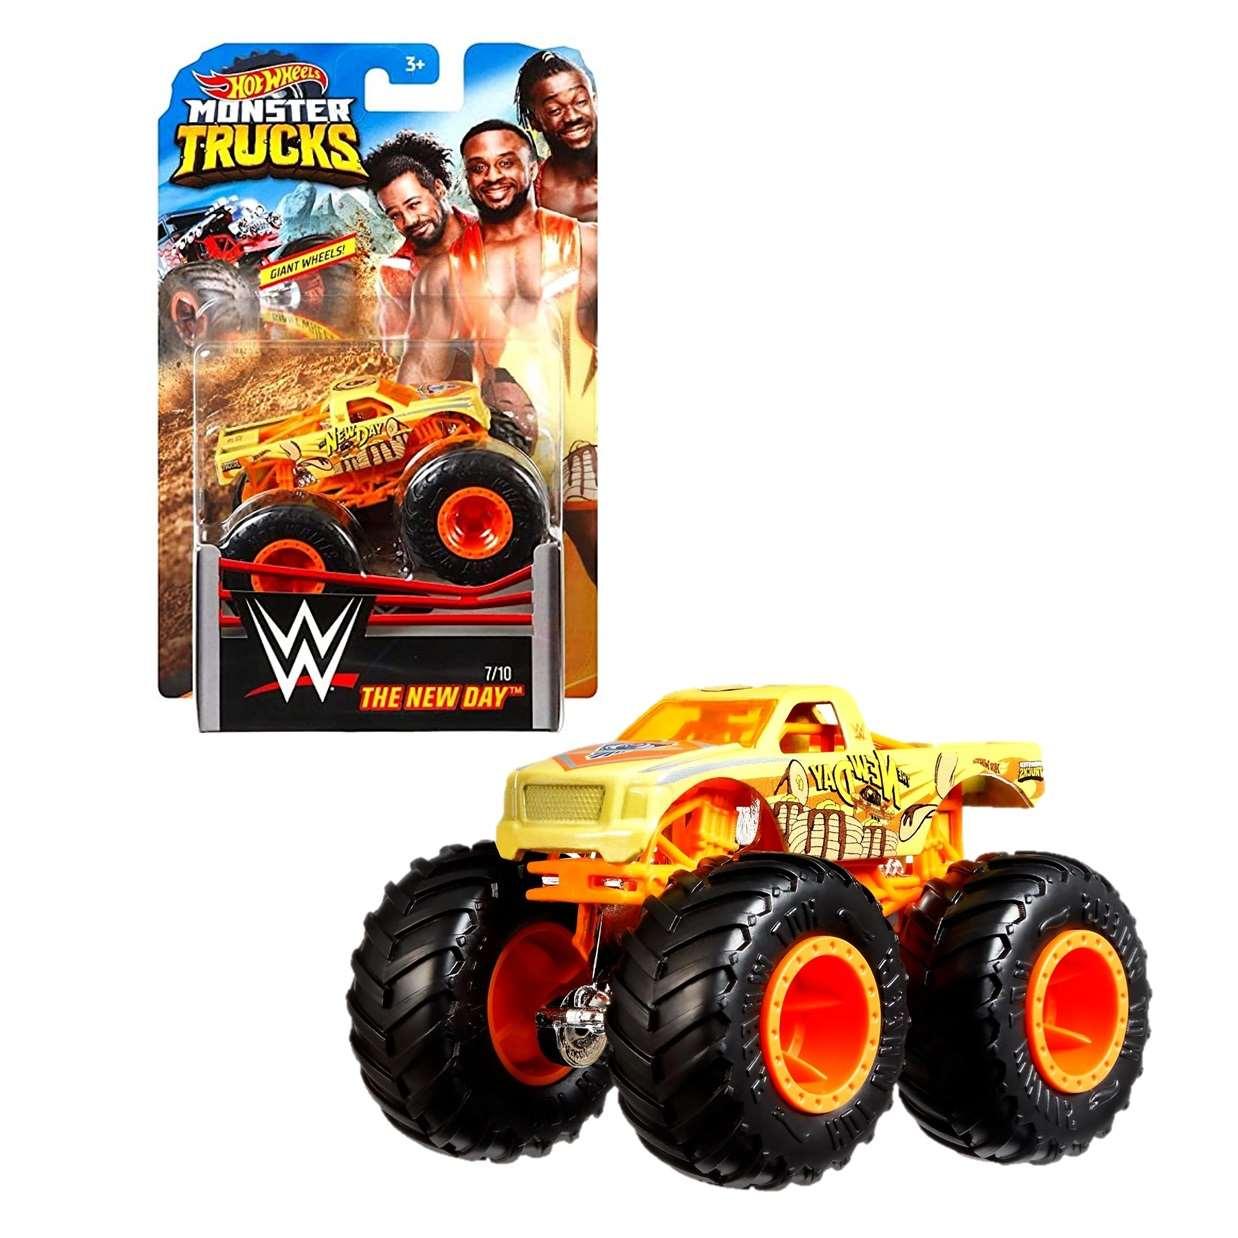 The New Day Pickup Wwe 7/10 Hot Wheels Monster Trucks